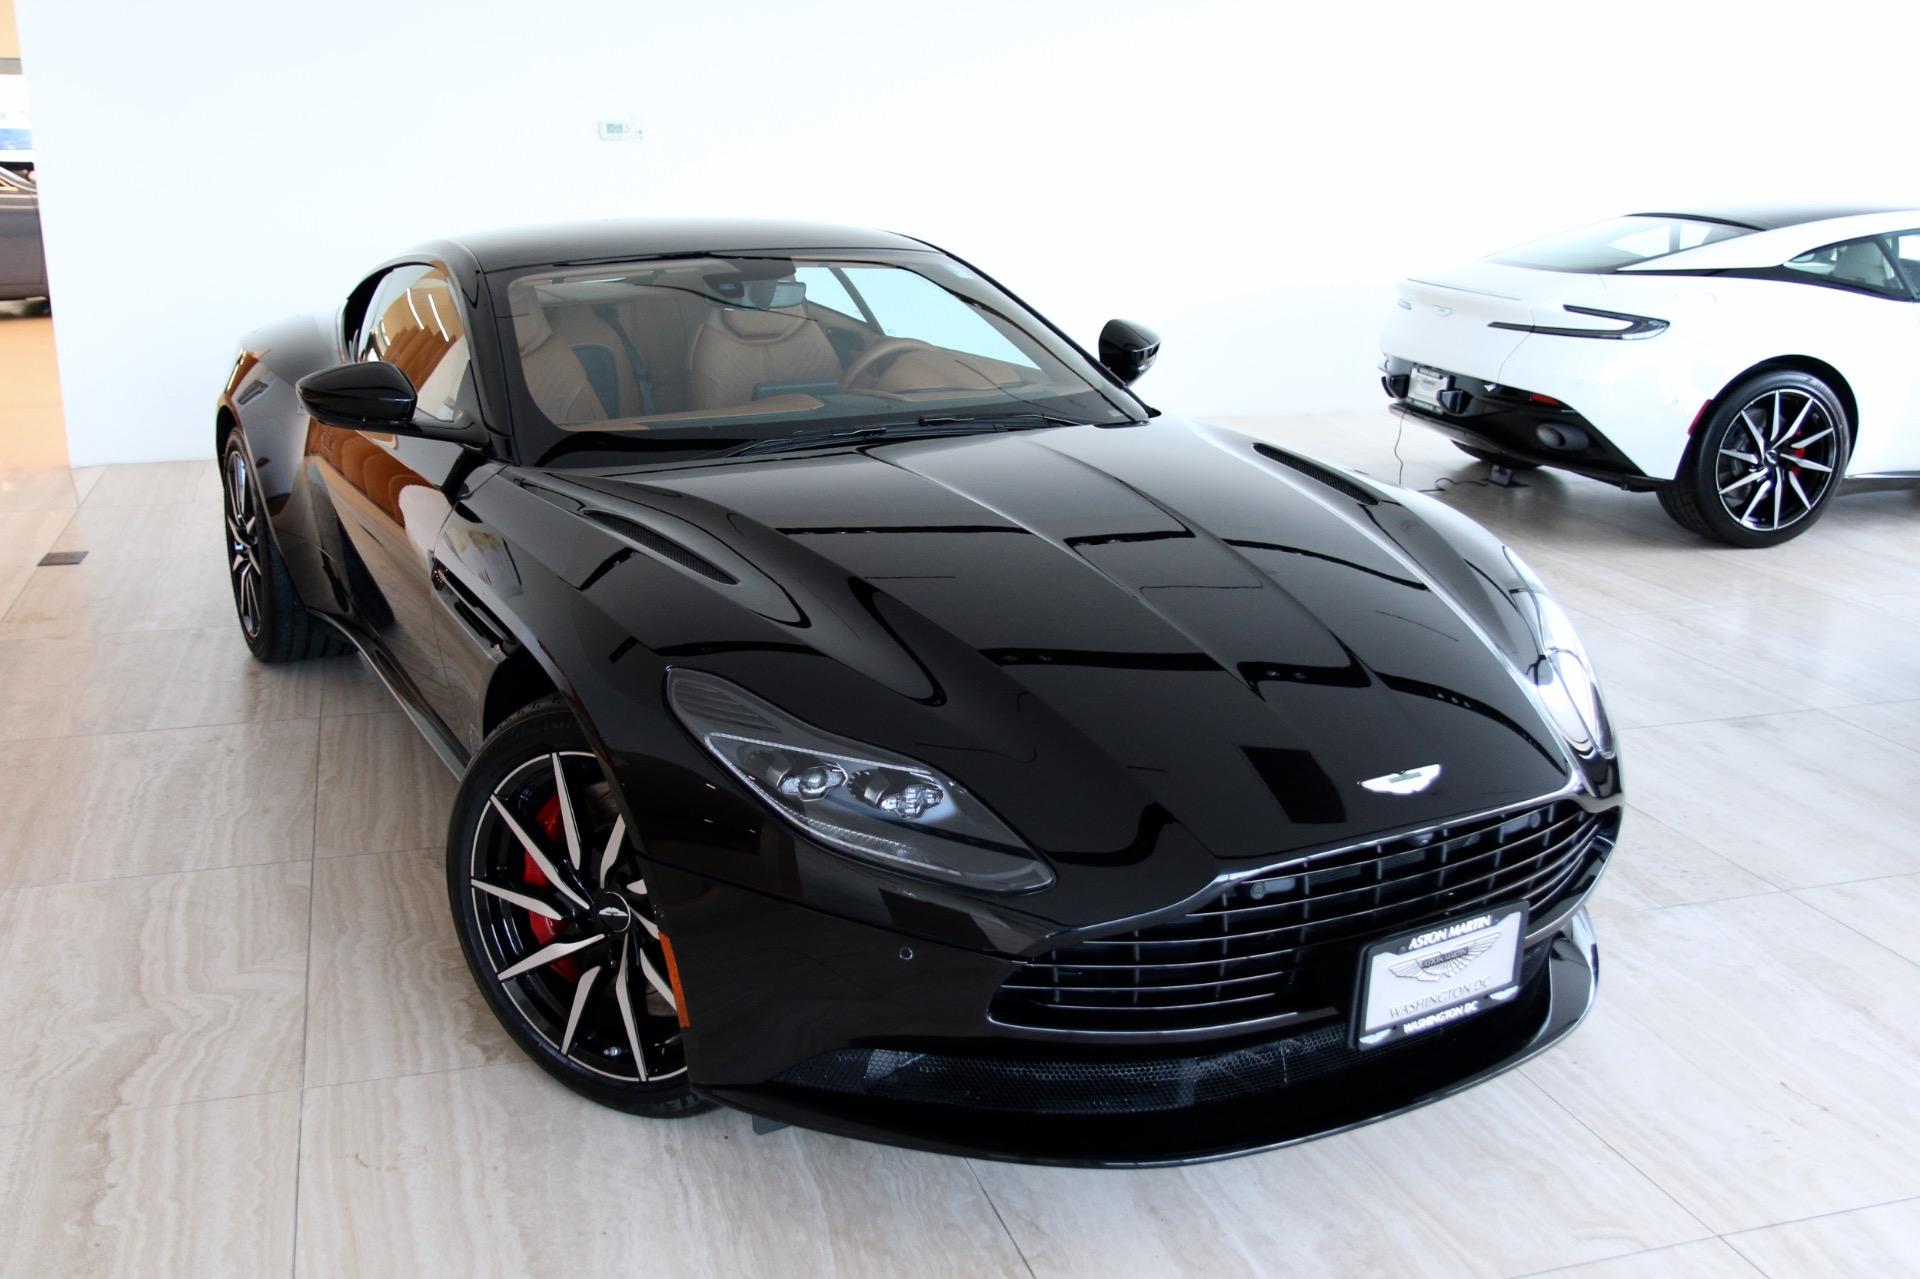 2018 Aston Martin Db11 V8 Stock 8l04040 For Sale Near Vienna Va